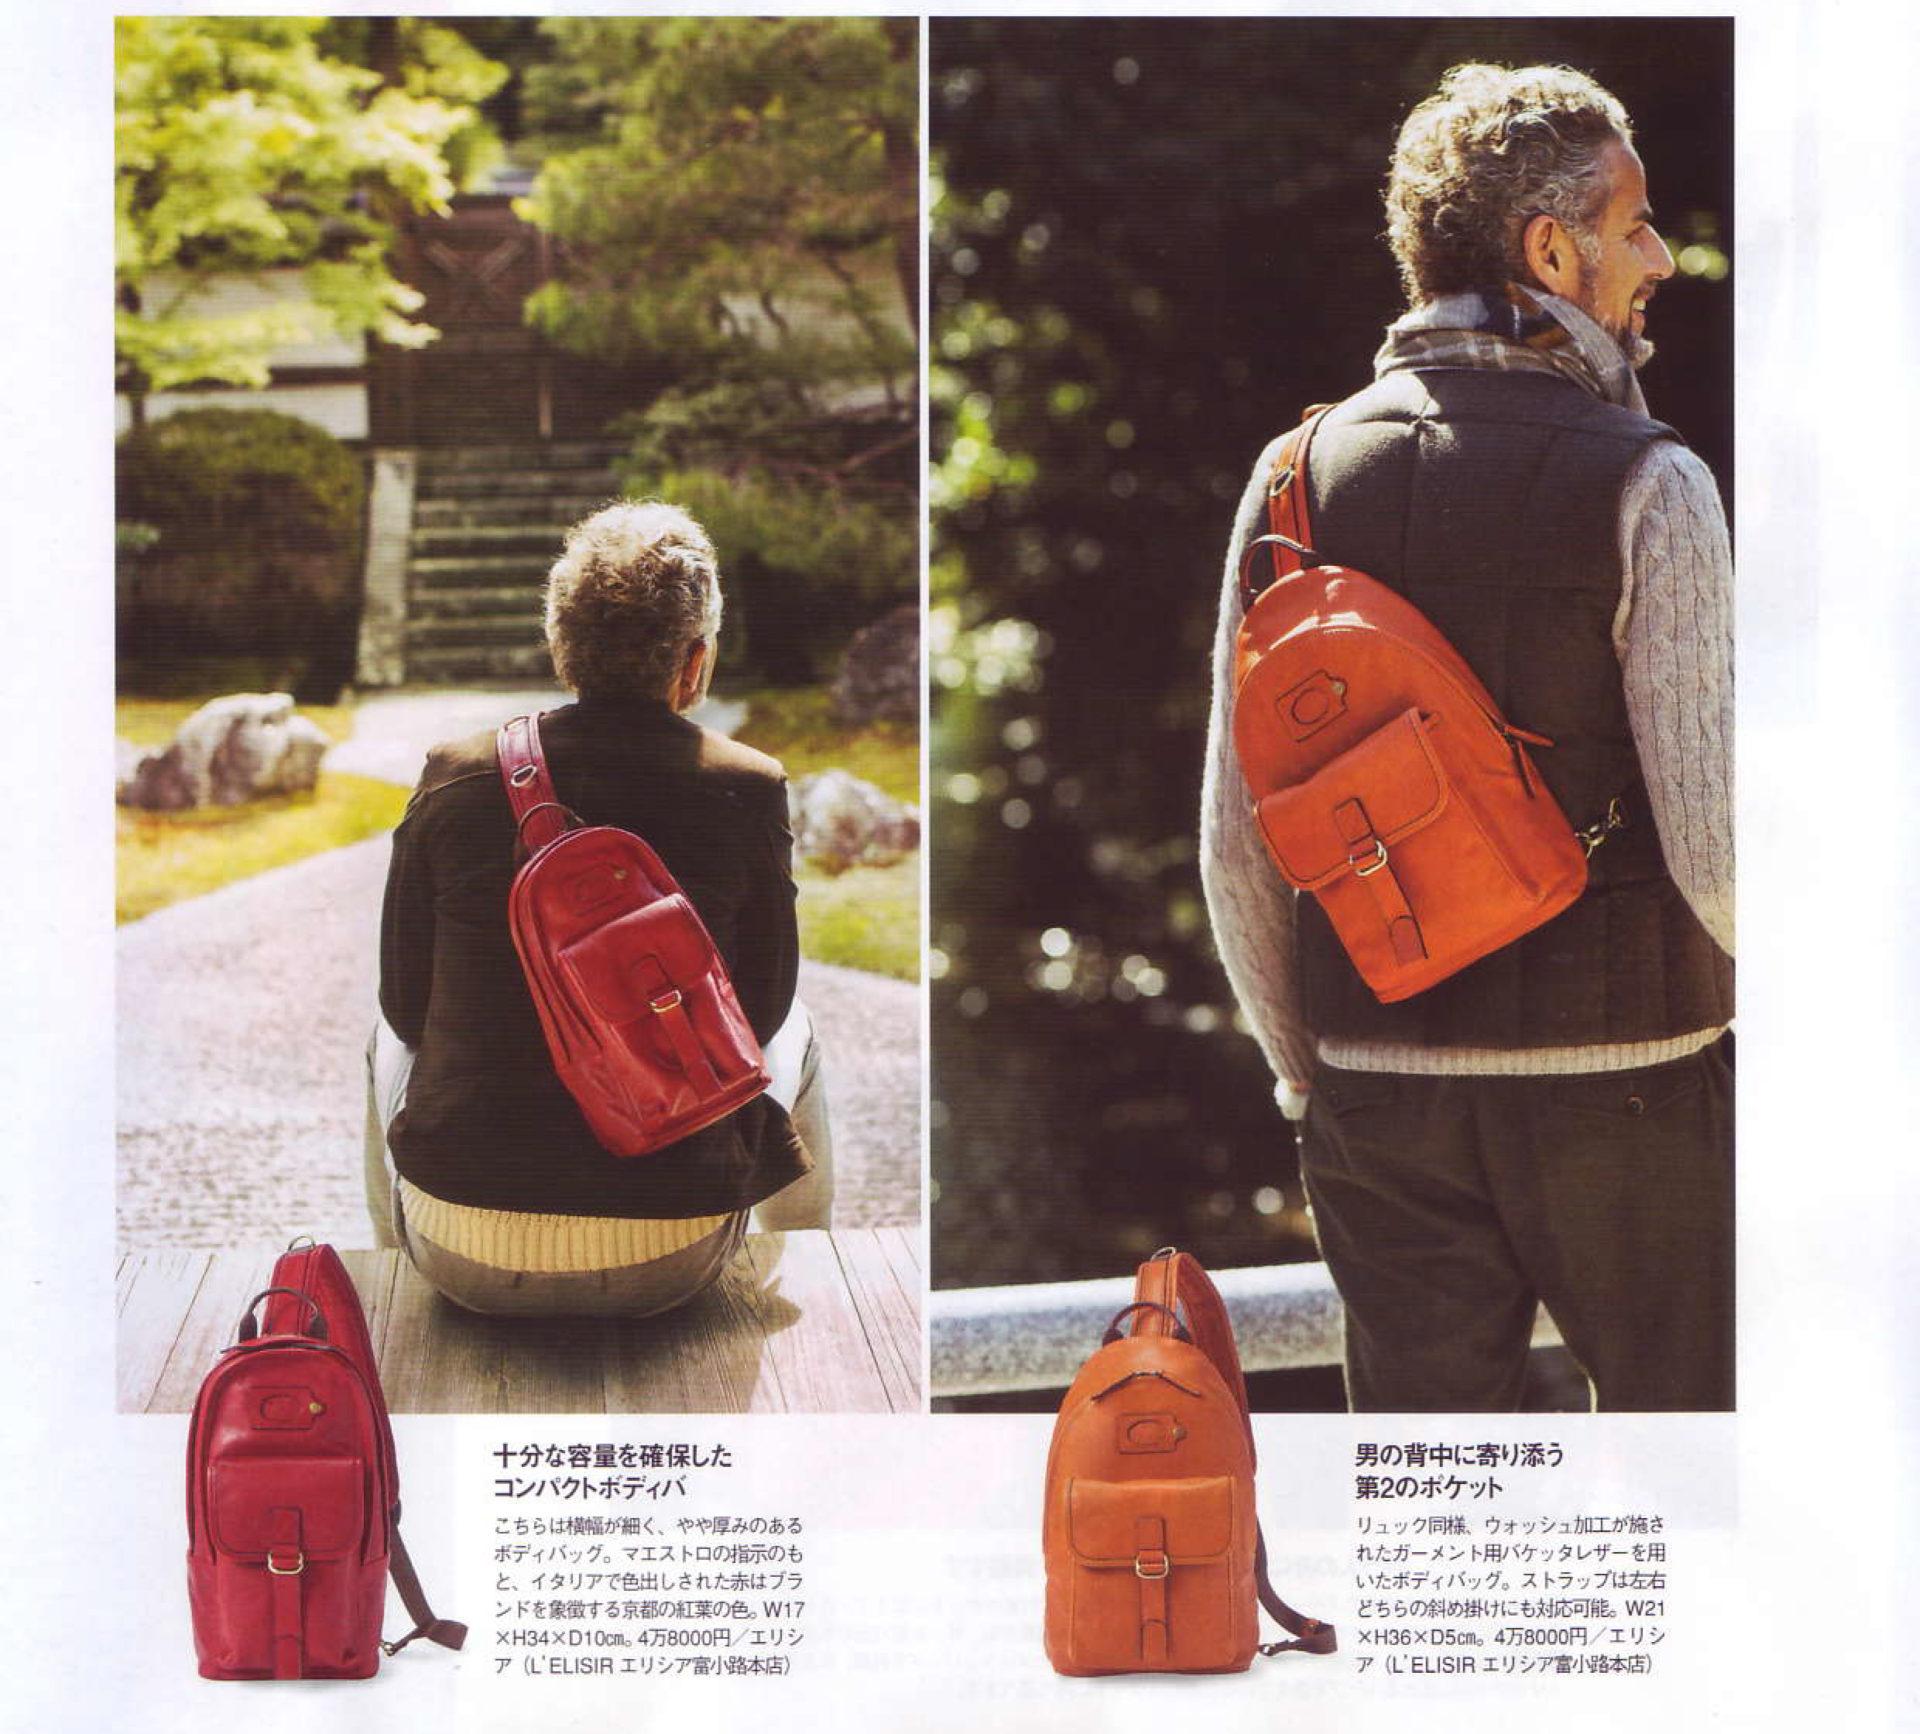 Numero Body bag Rosso caede京都